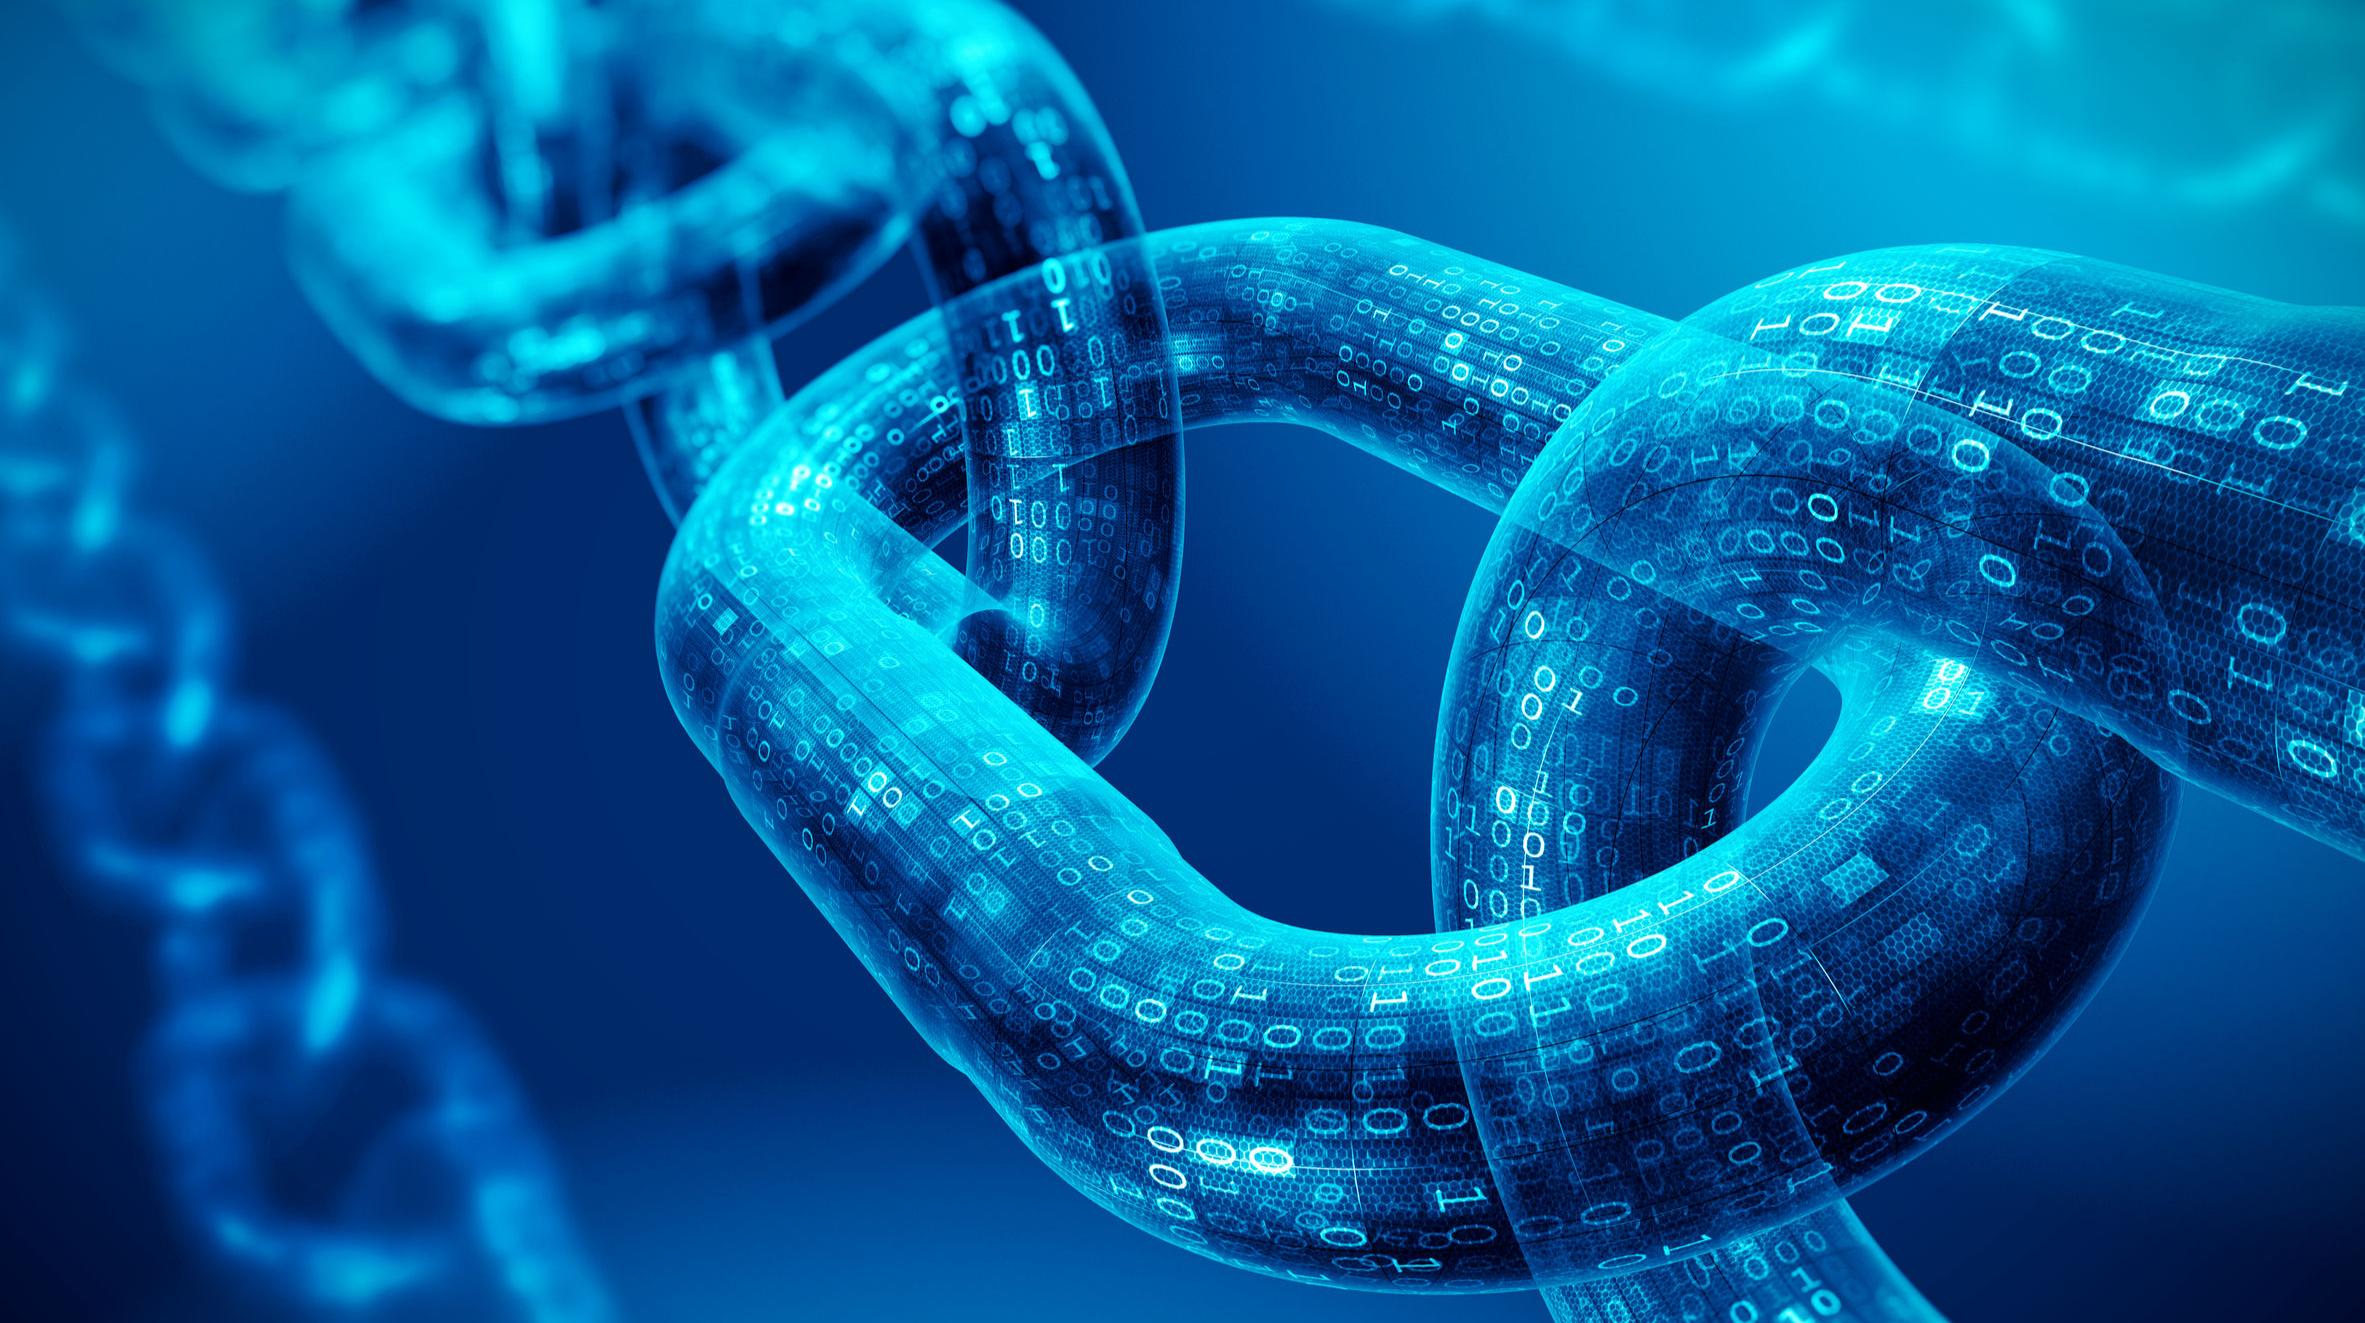 rees scientific chain